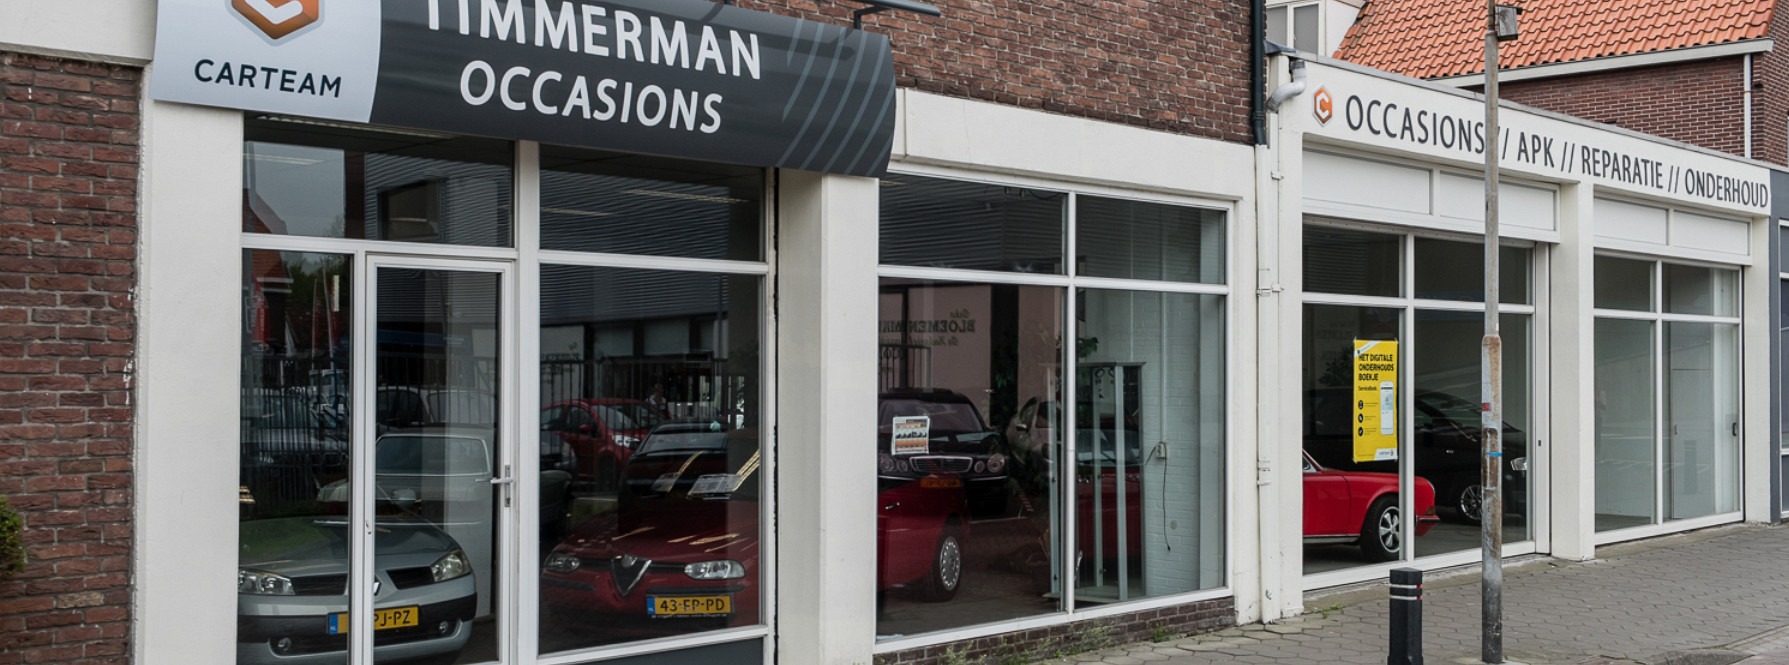 Carteam Autobedrijf Timmerman